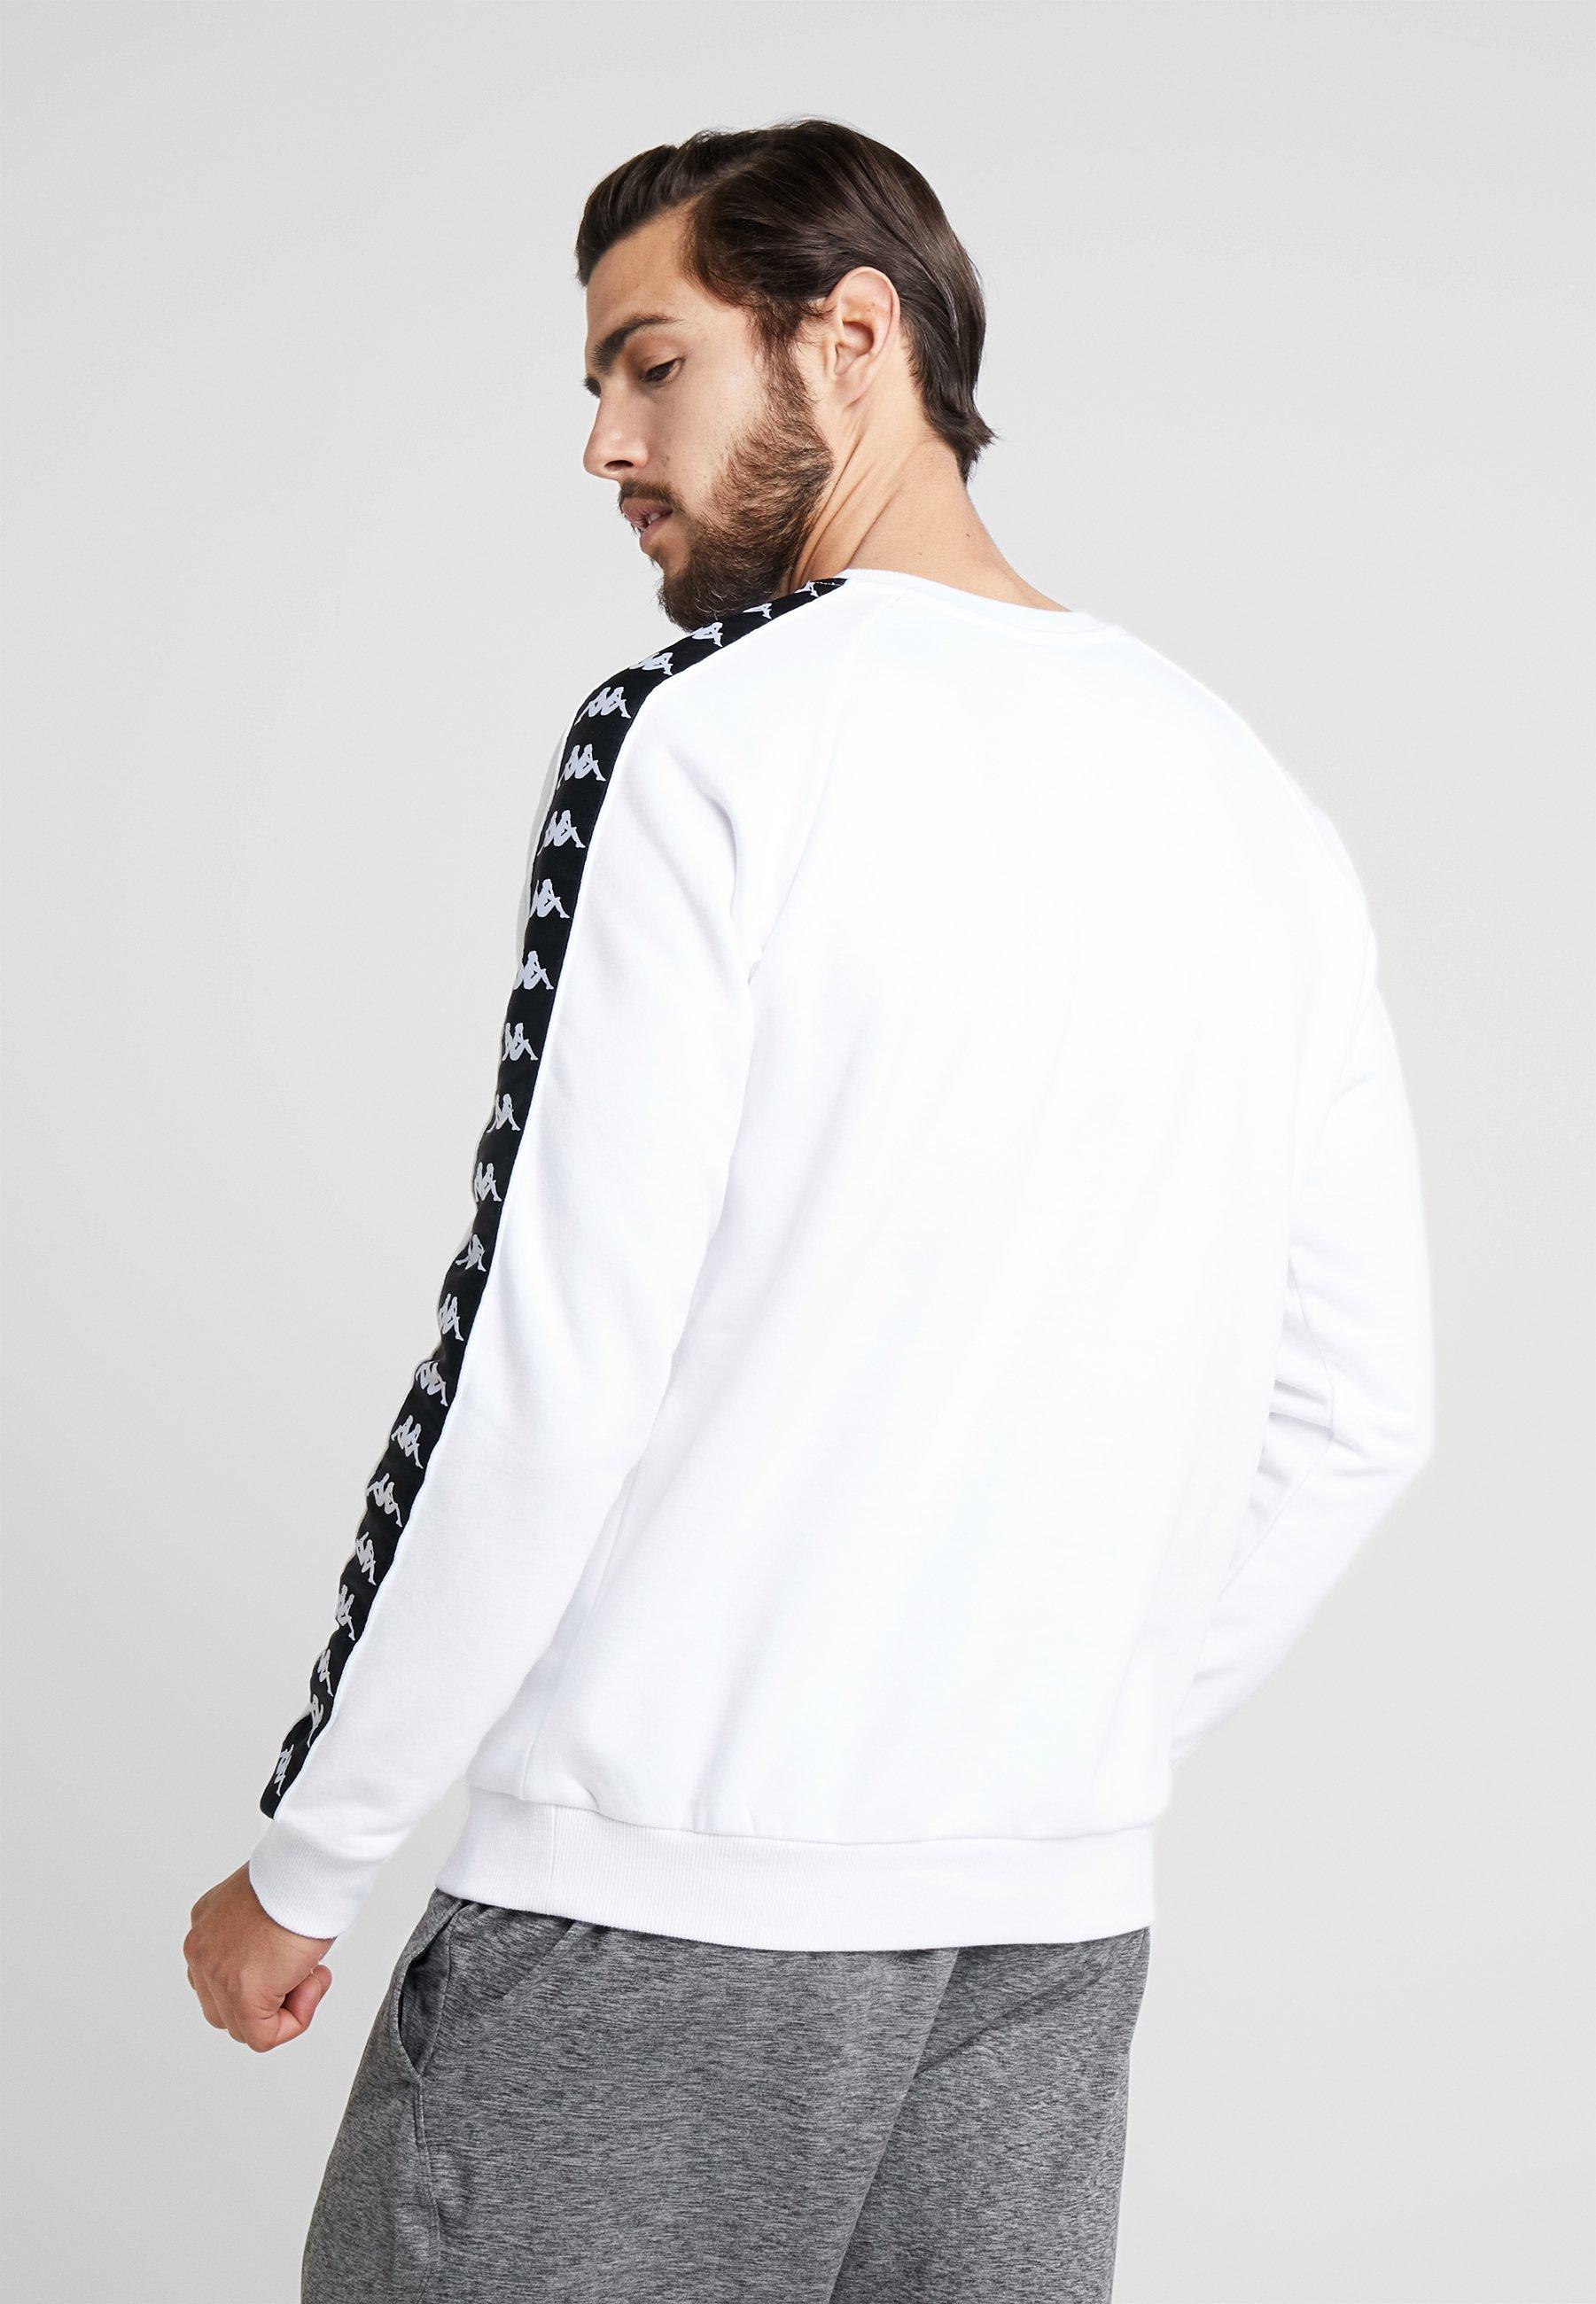 FaddeiSweatshirt White Bright Kappa FaddeiSweatshirt Kappa Bright Kappa White 3TFlK1cuJ